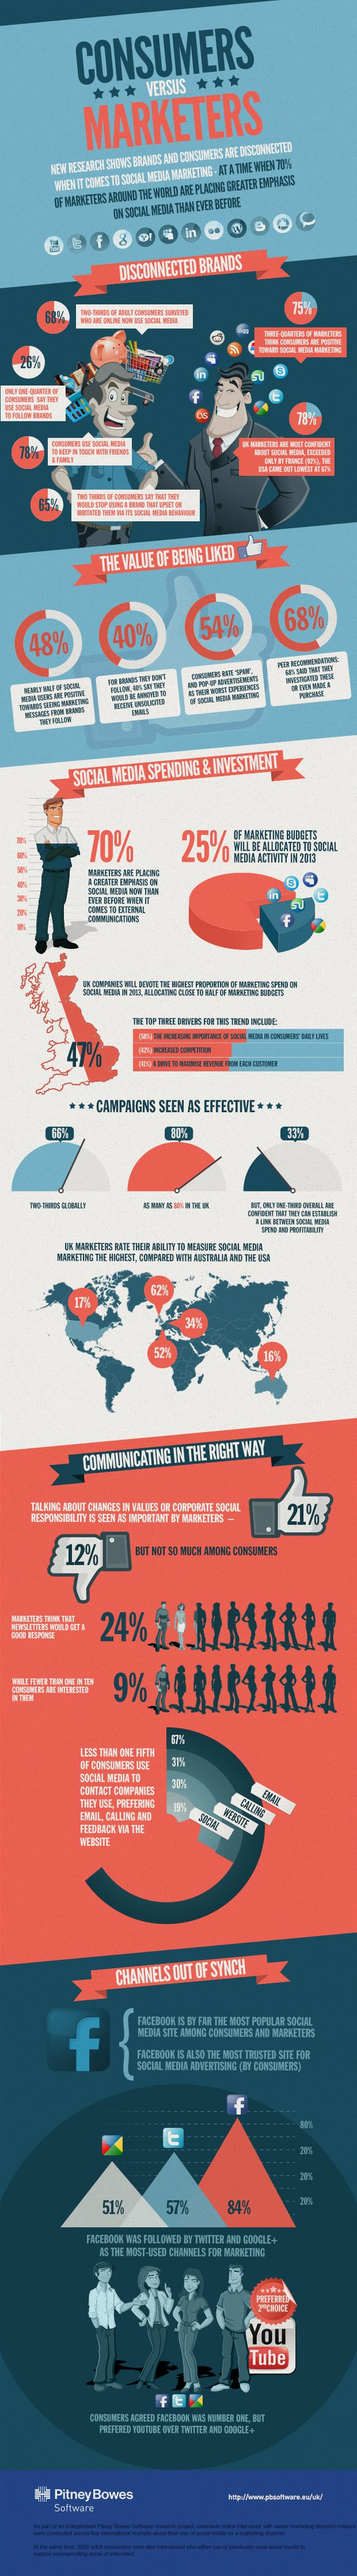 Consumers vs. Marketers on social media